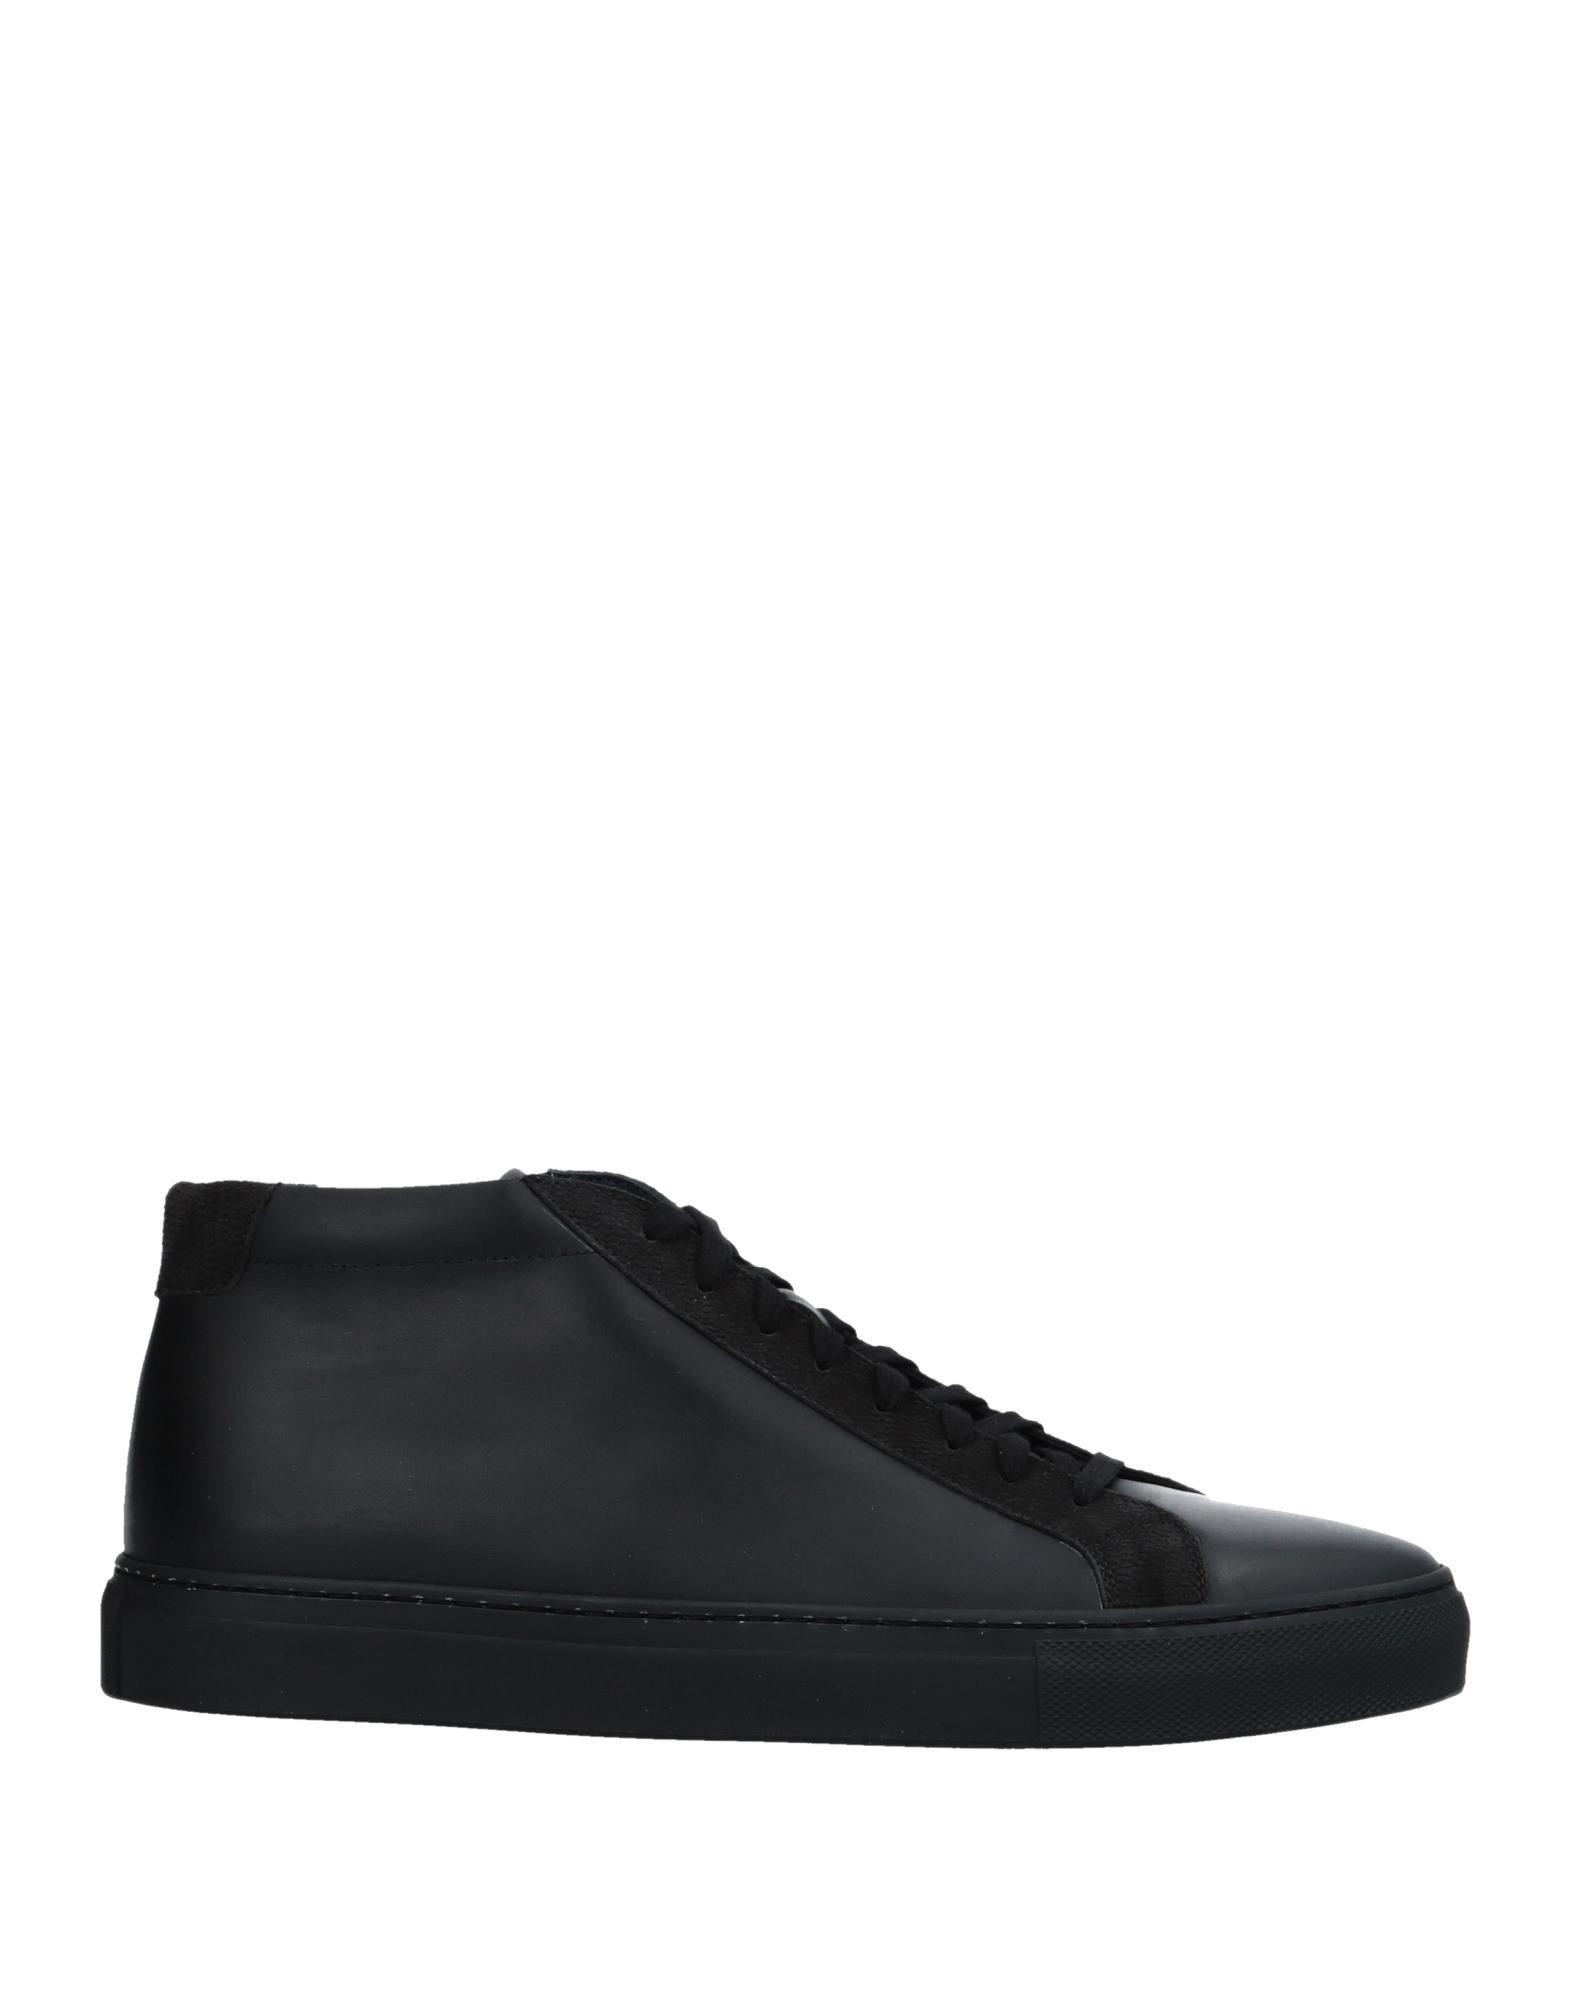 Fabiano Ricci Sneakers Herren  11508829XE Gute Qualität beliebte Schuhe